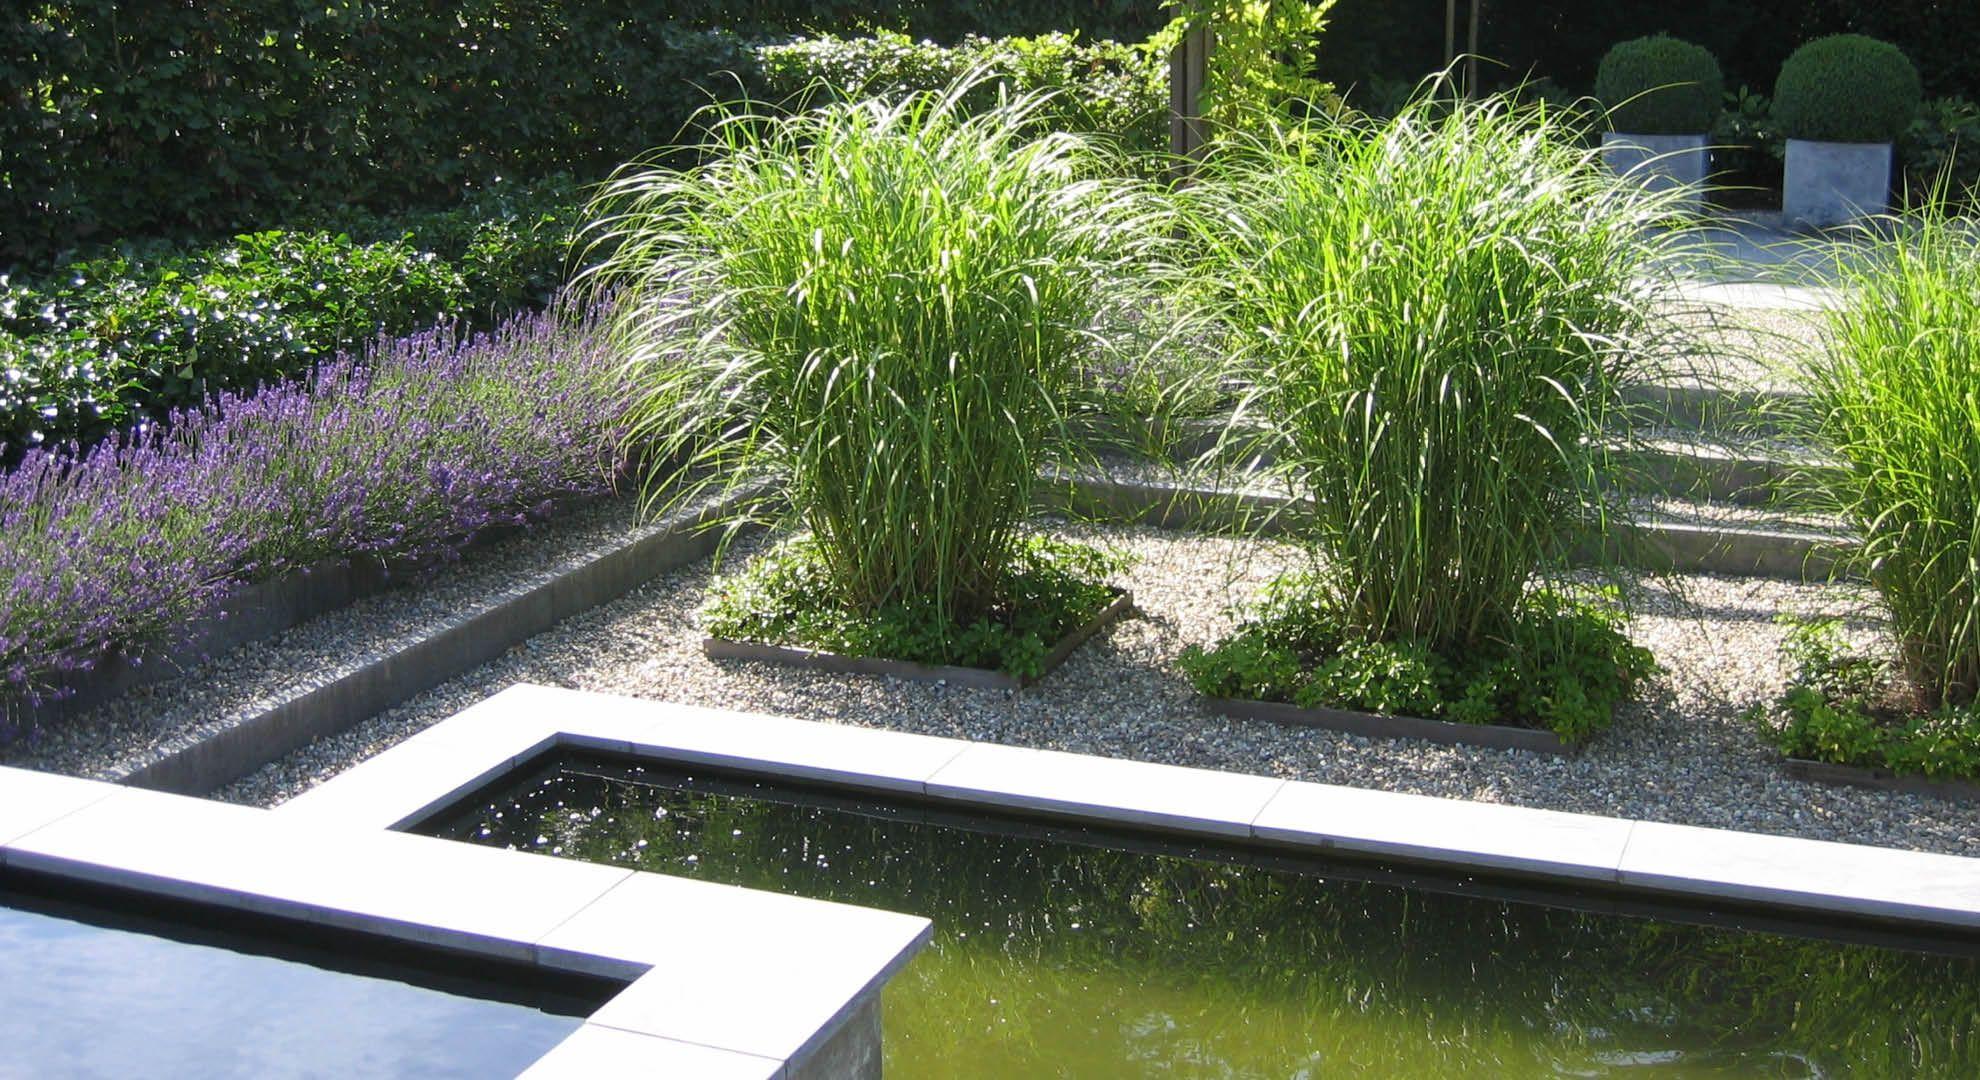 Landelijke tuin in de polder rodenburg tuinen vtwctr